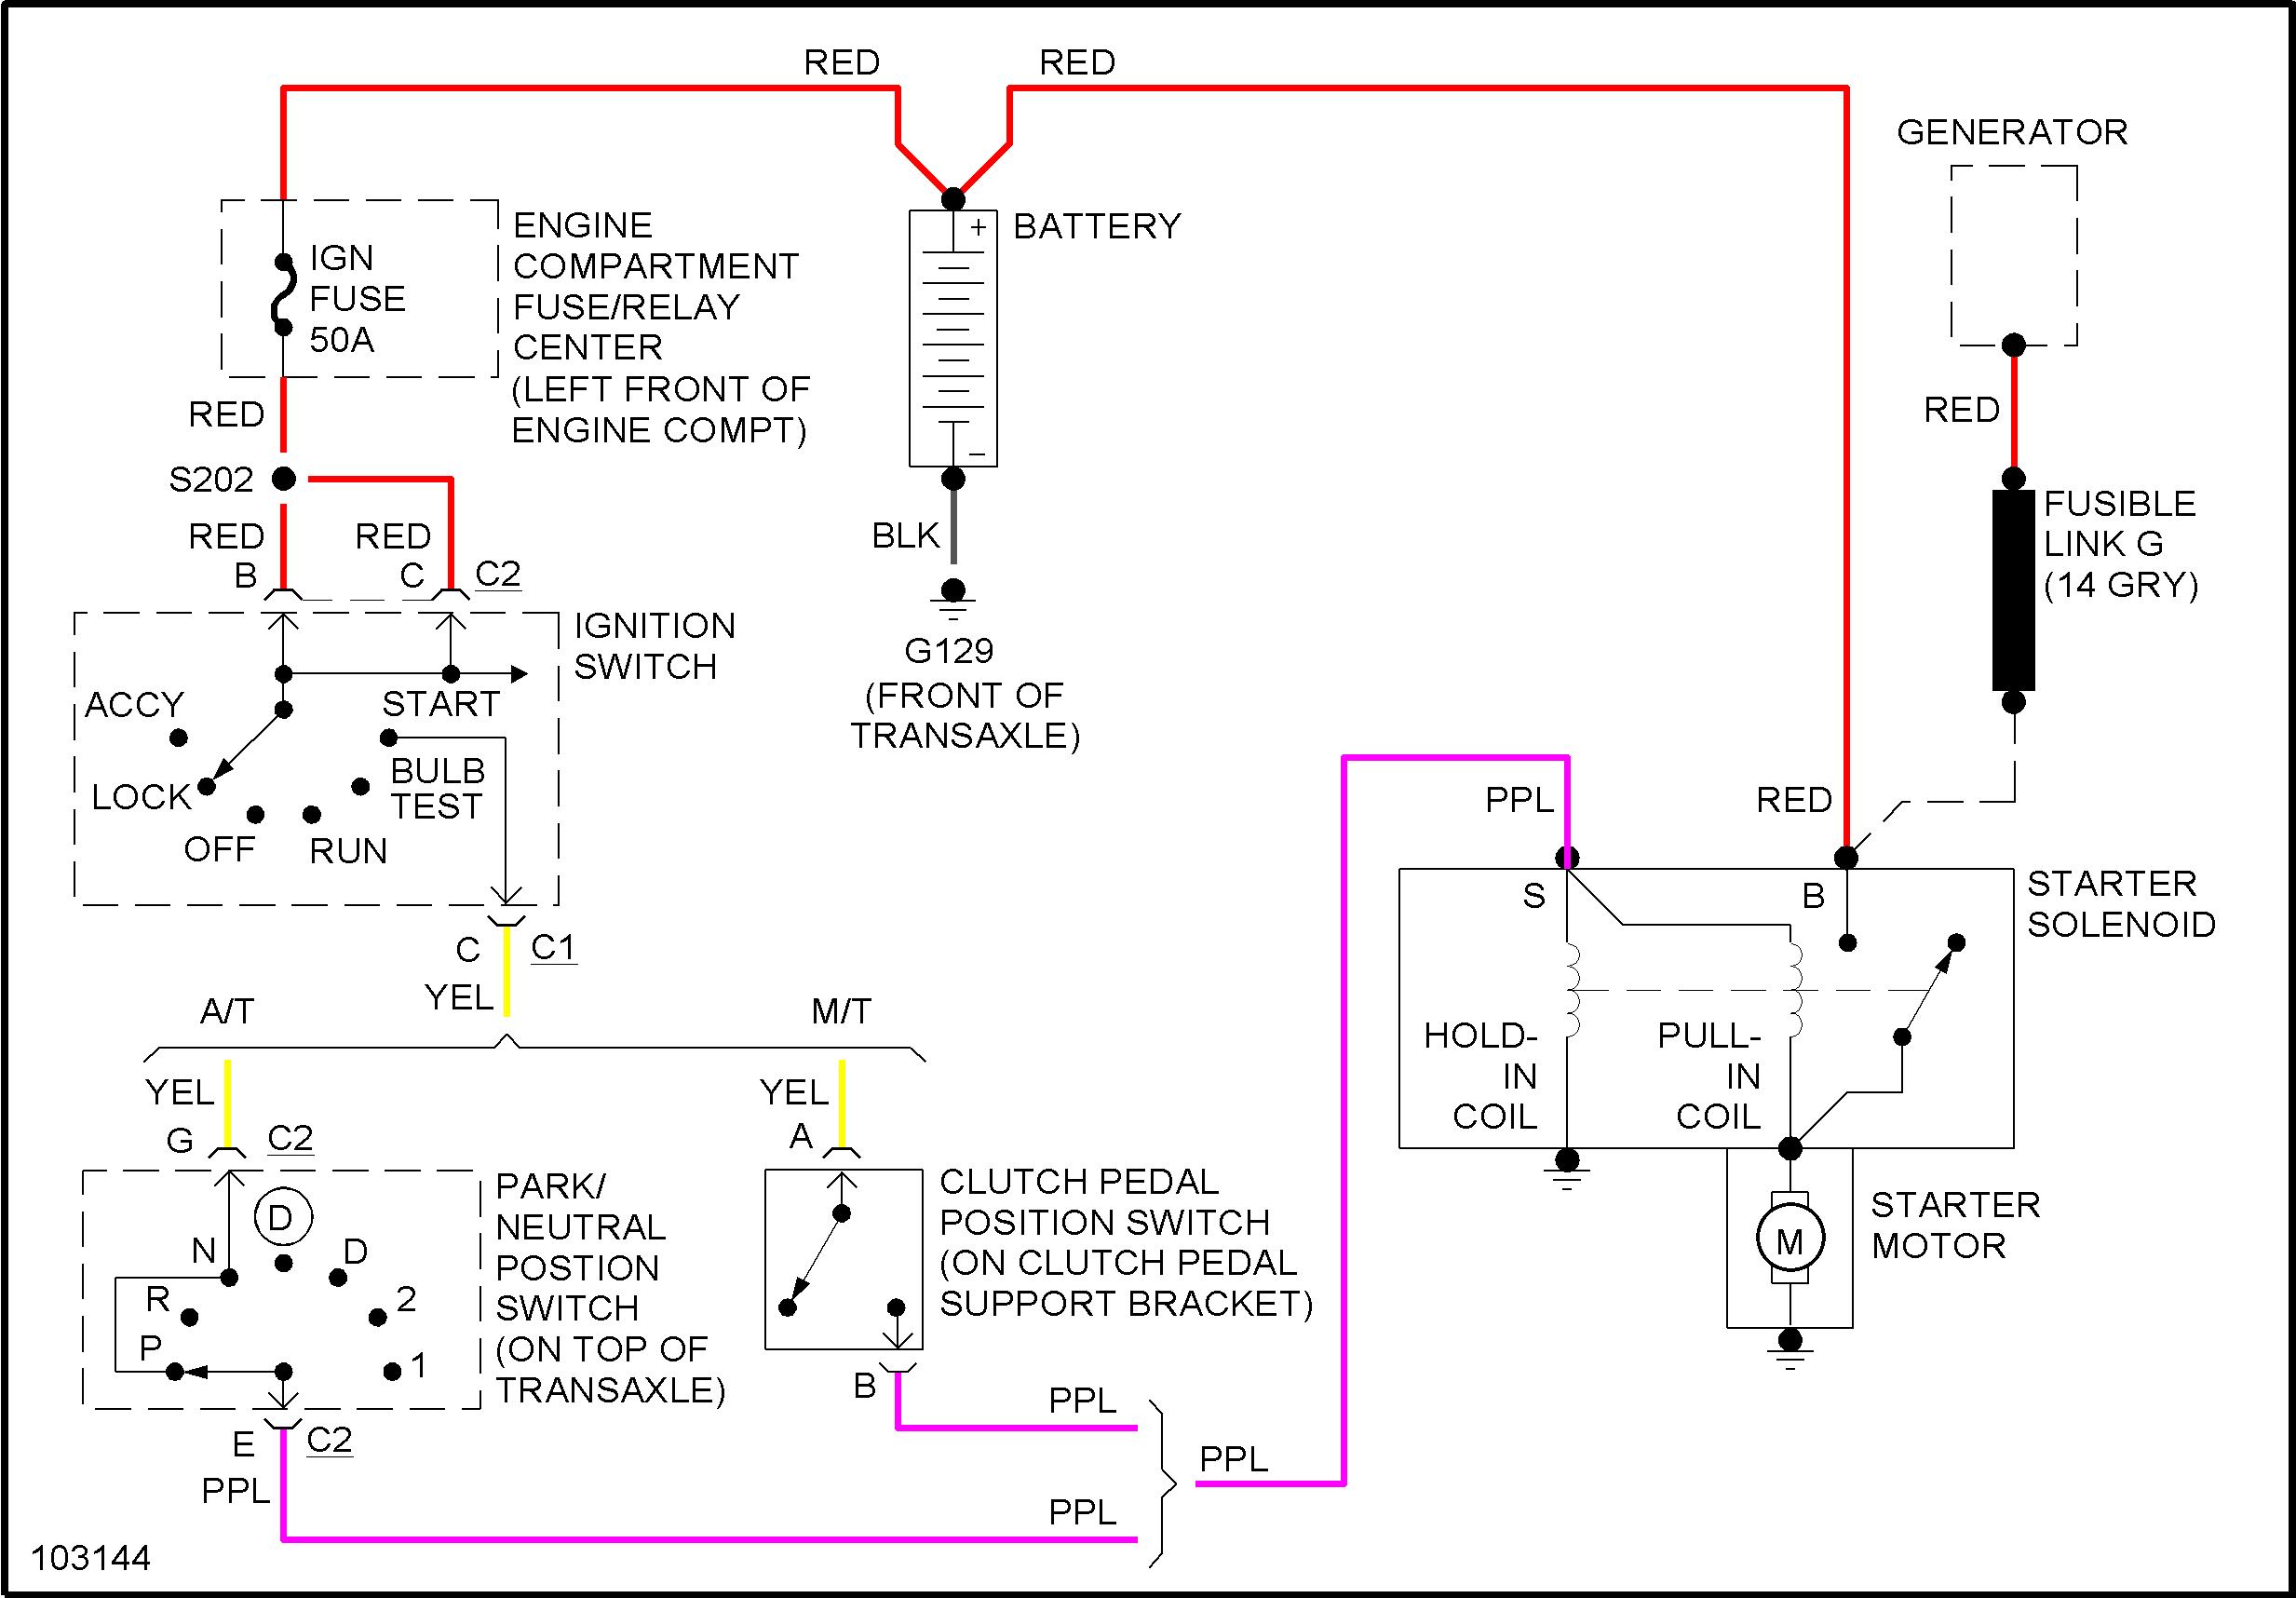 d869fb0e-79aa-4c37-871e-69161d4ac5a8_starting circuit.png